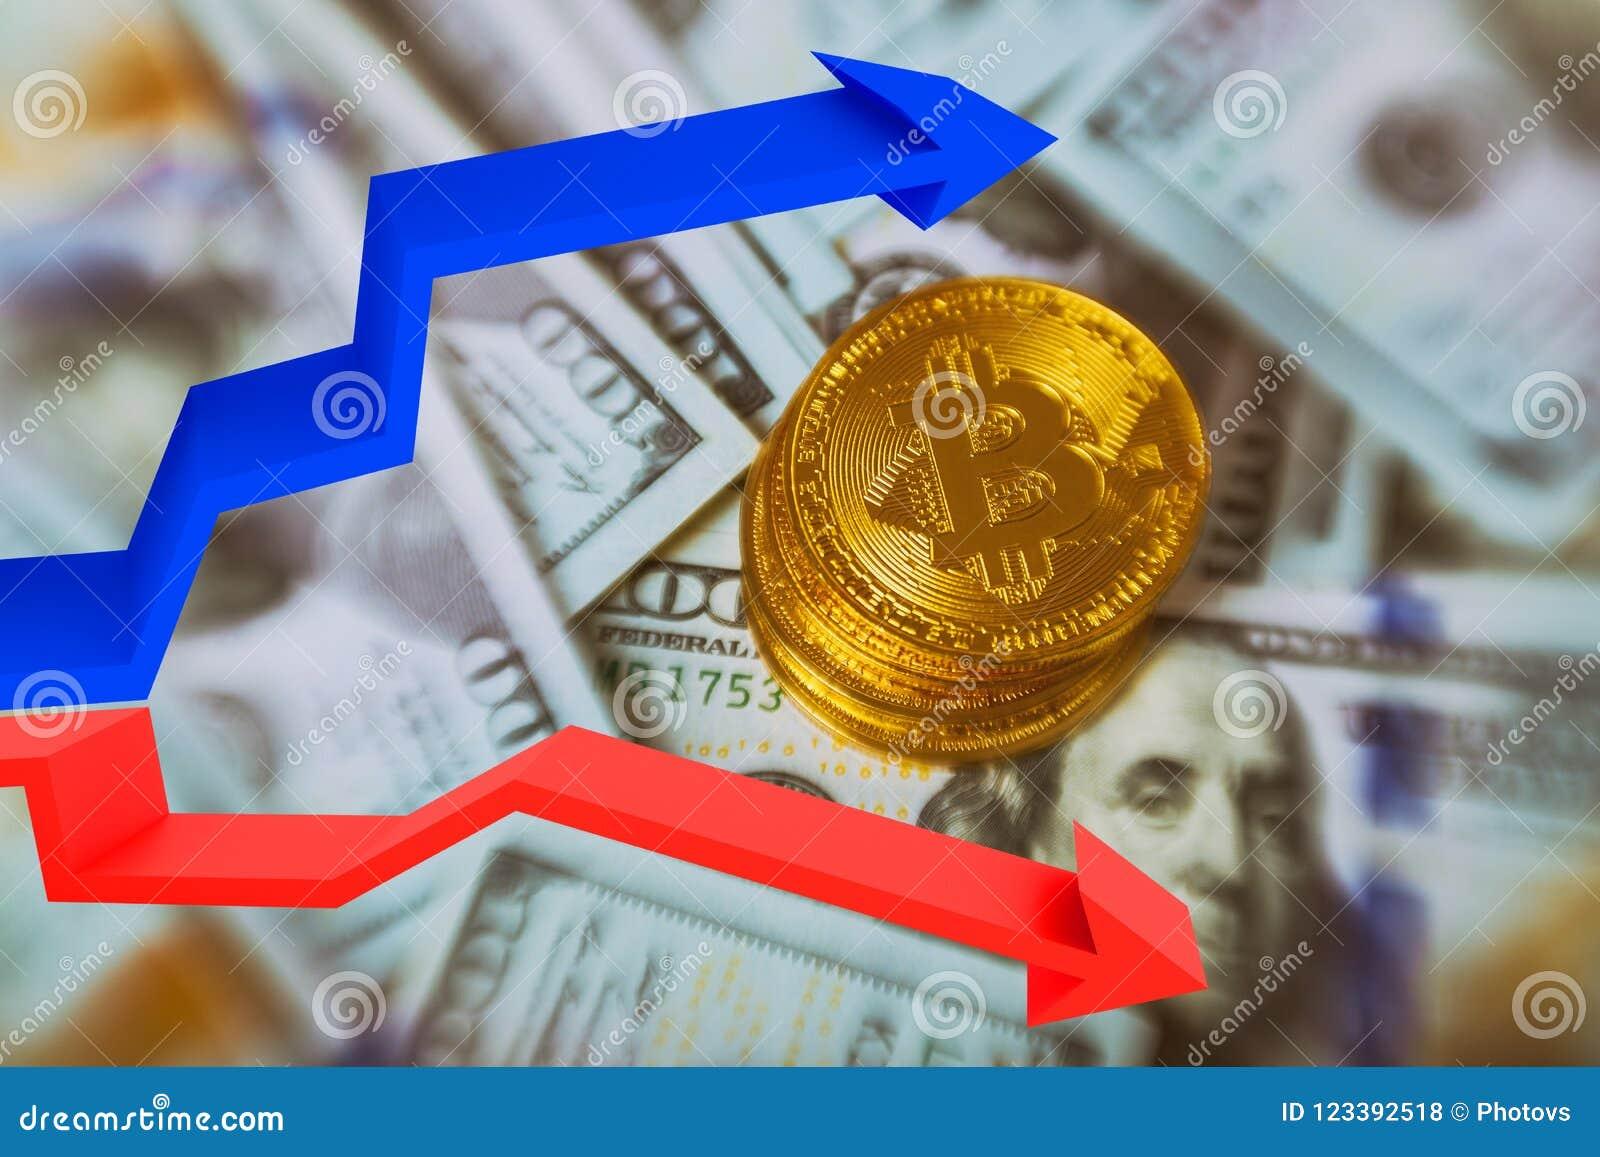 btc money changer